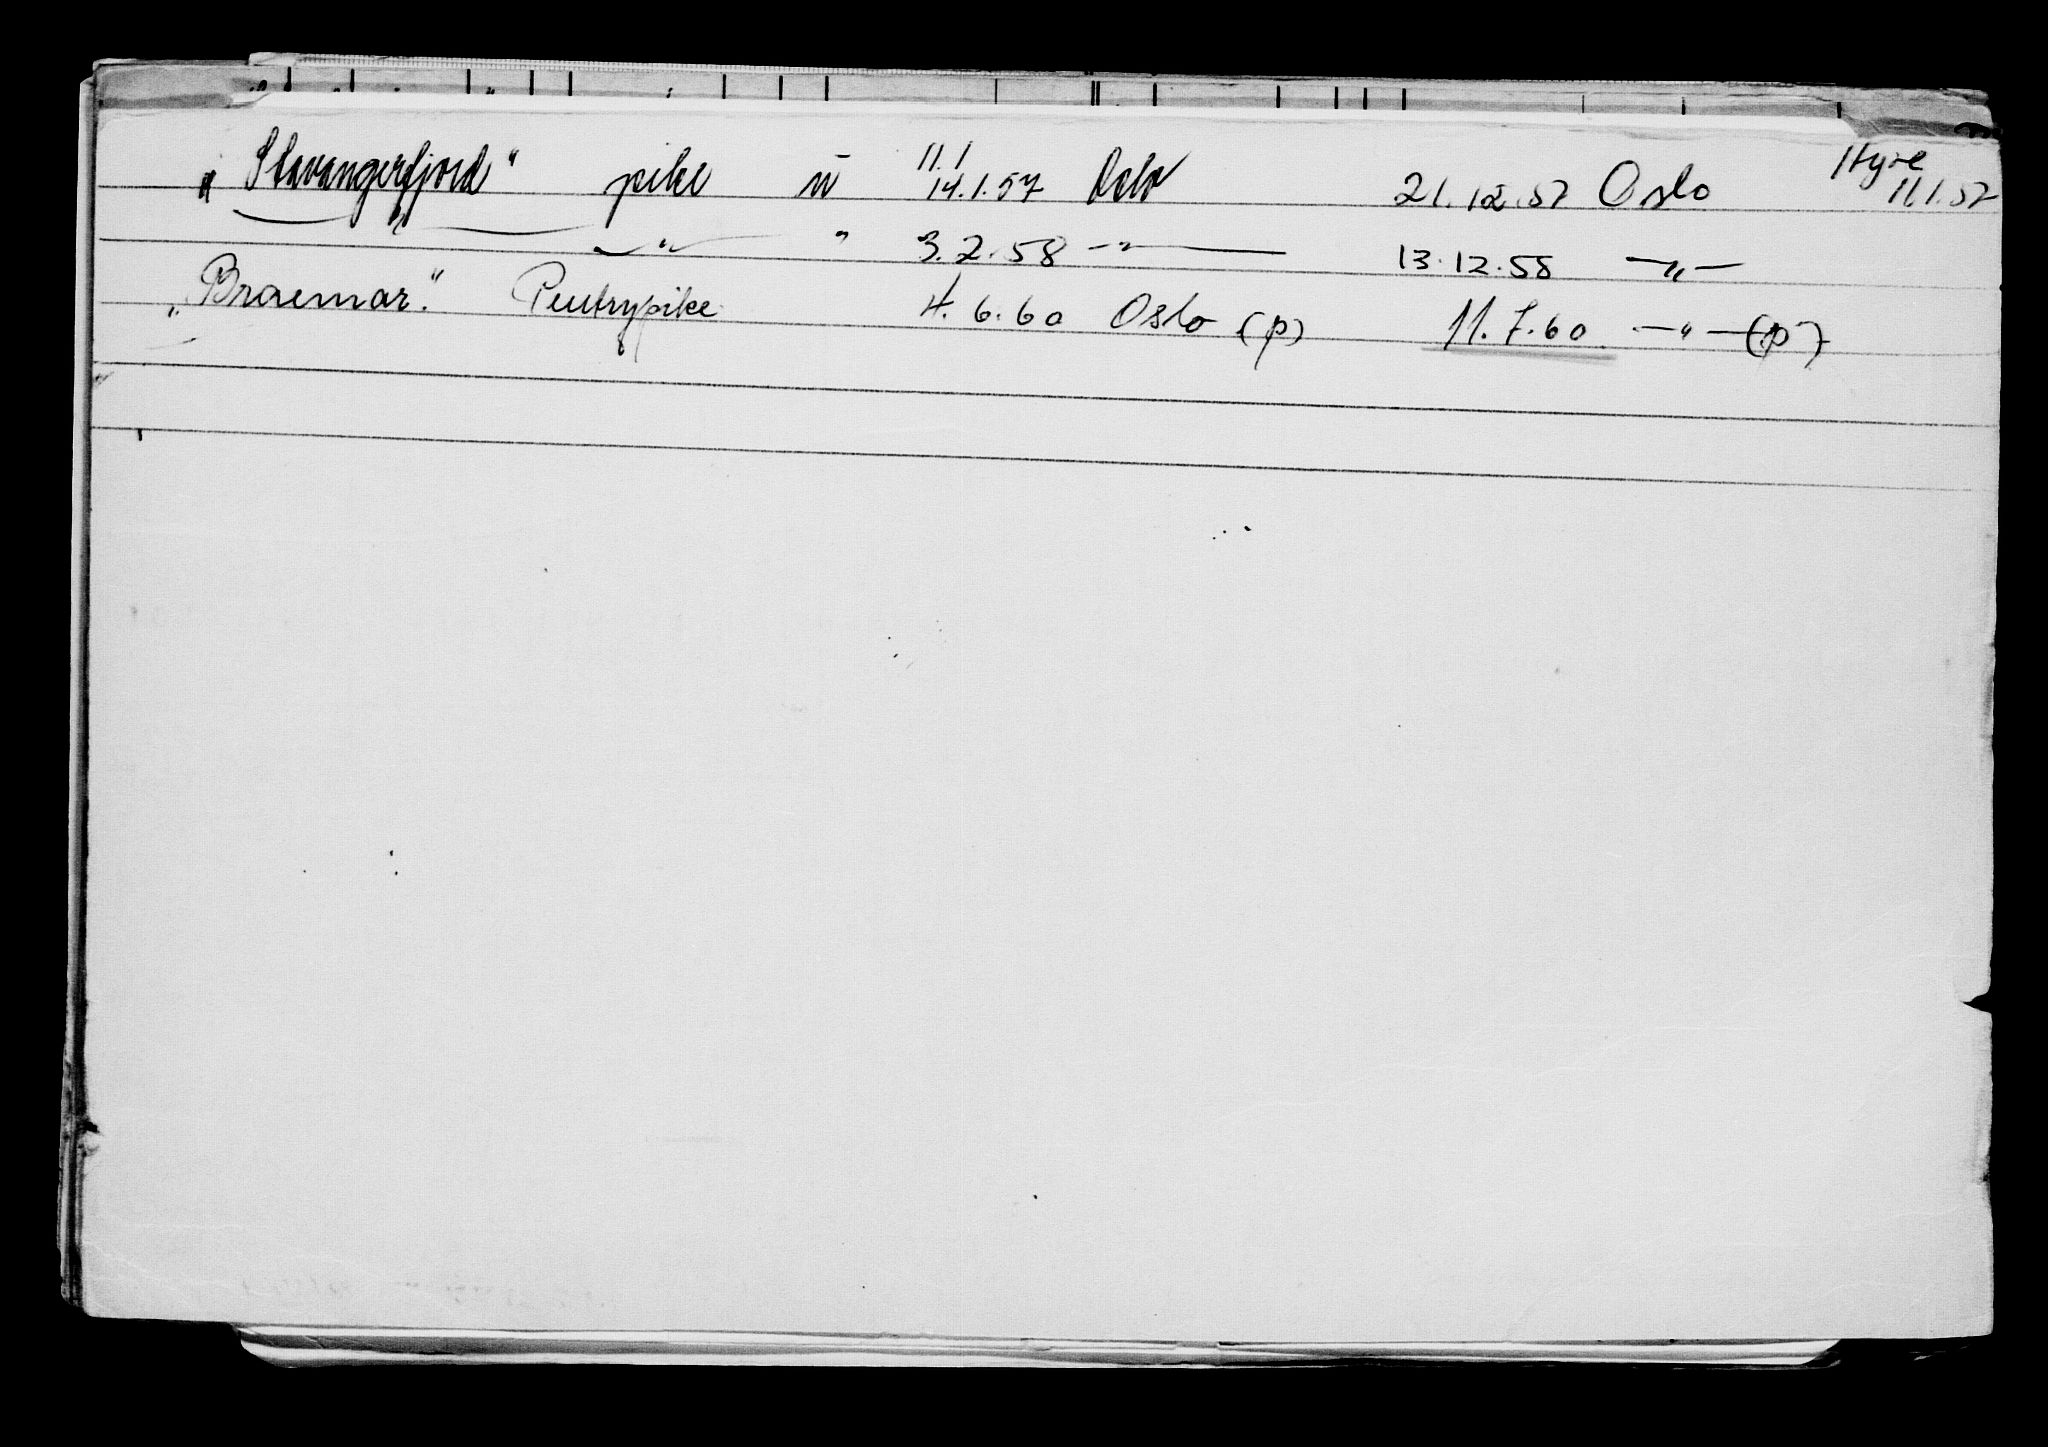 RA, Direktoratet for sjømenn, G/Gb/L0021: Hovedkort, 1896, s. 2